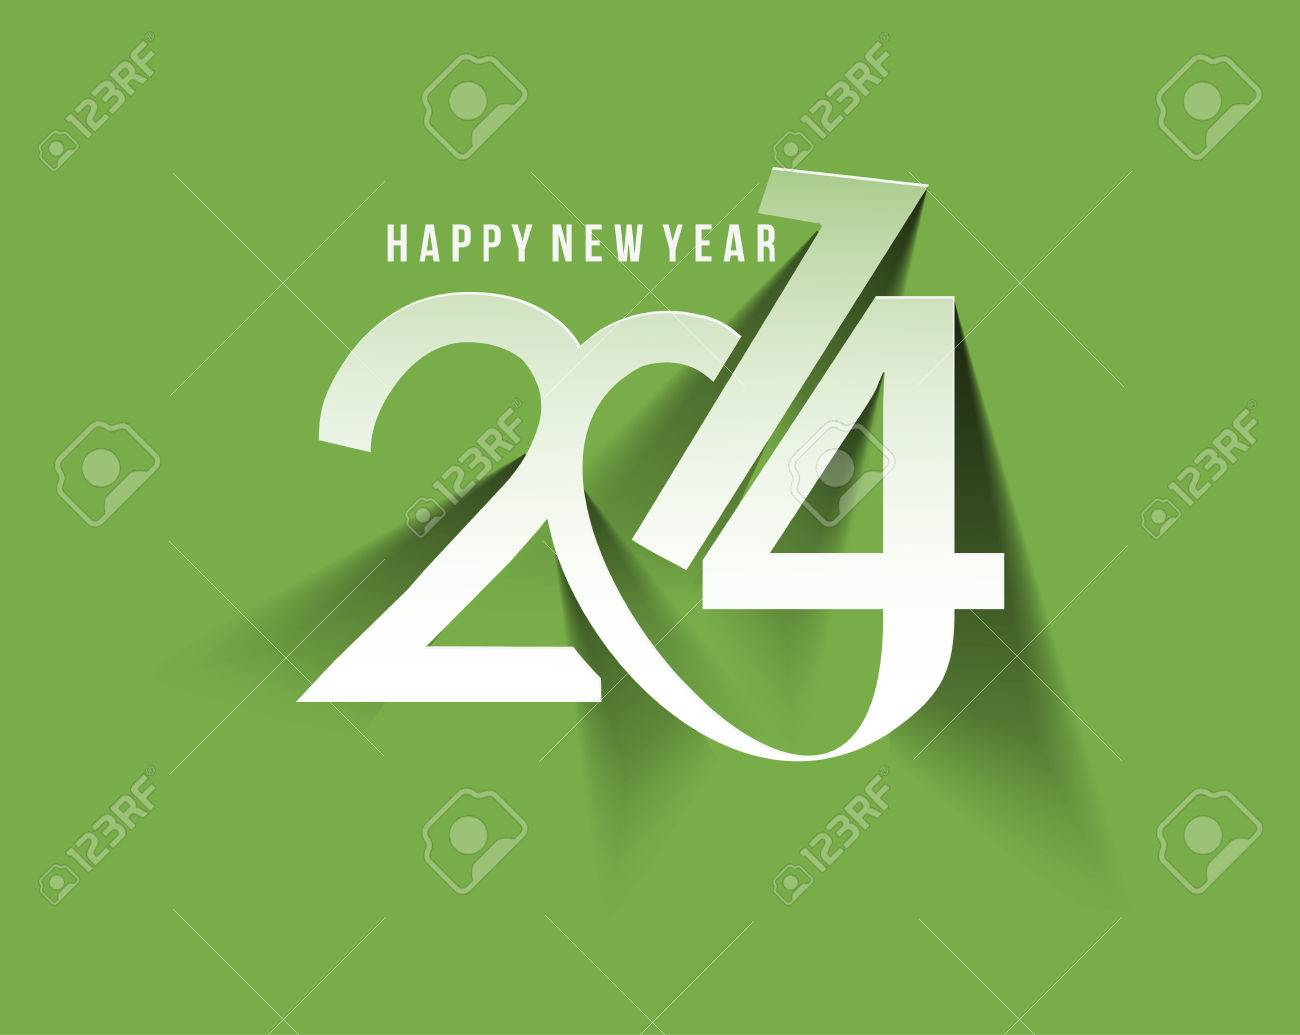 Happy New Year 2014 Text Design Stock Vector - 24190615